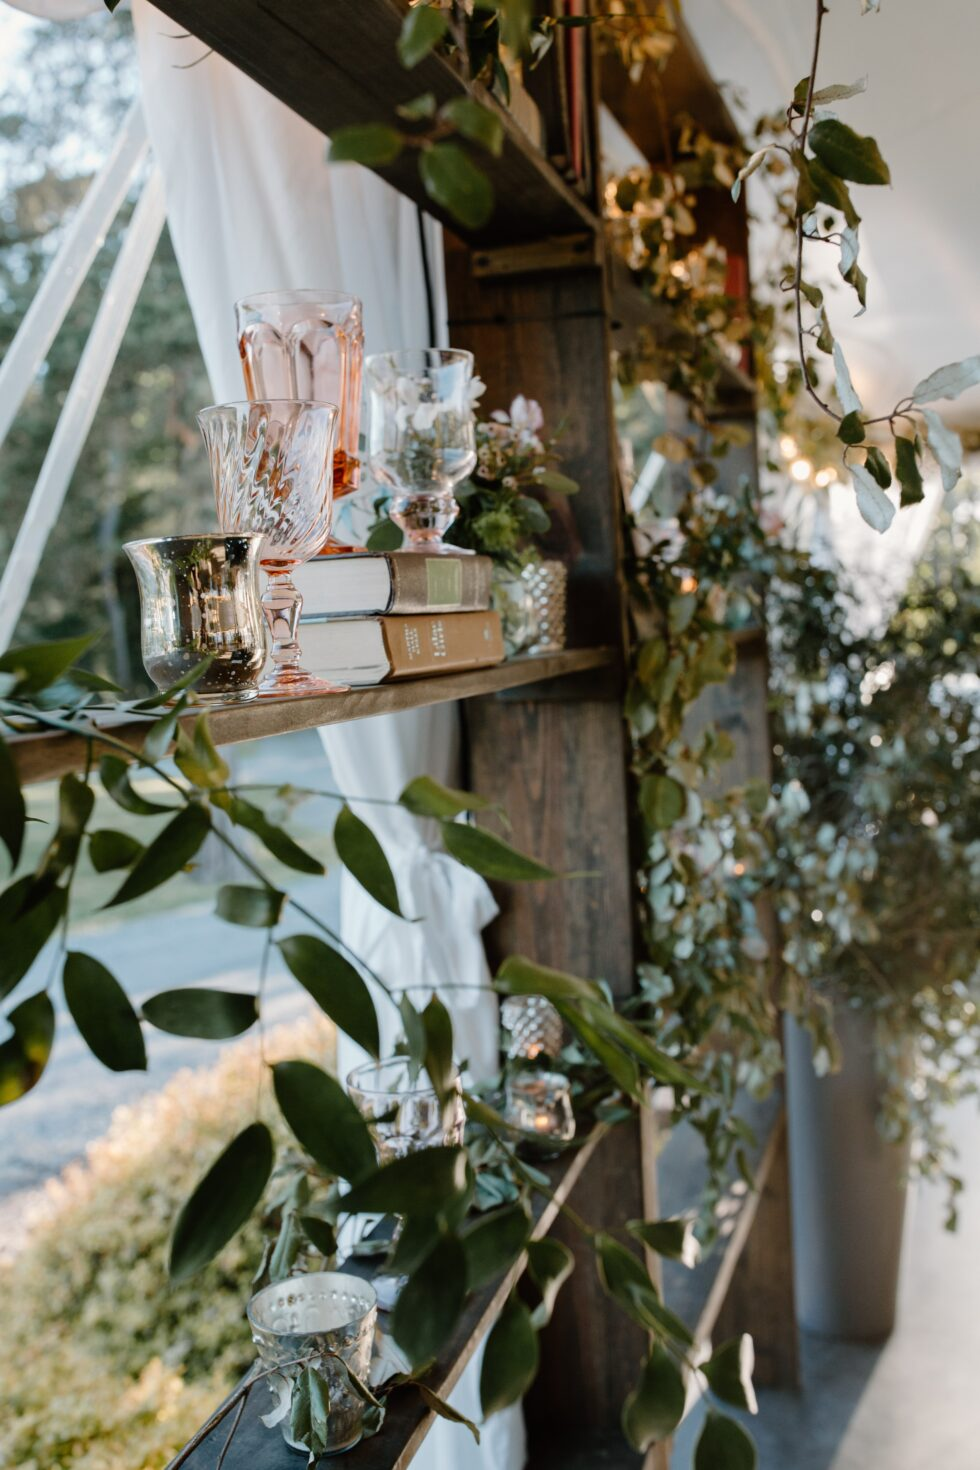 Spring-Wedding-at-Summerfield-Farms-Rachel-and-Brian-35